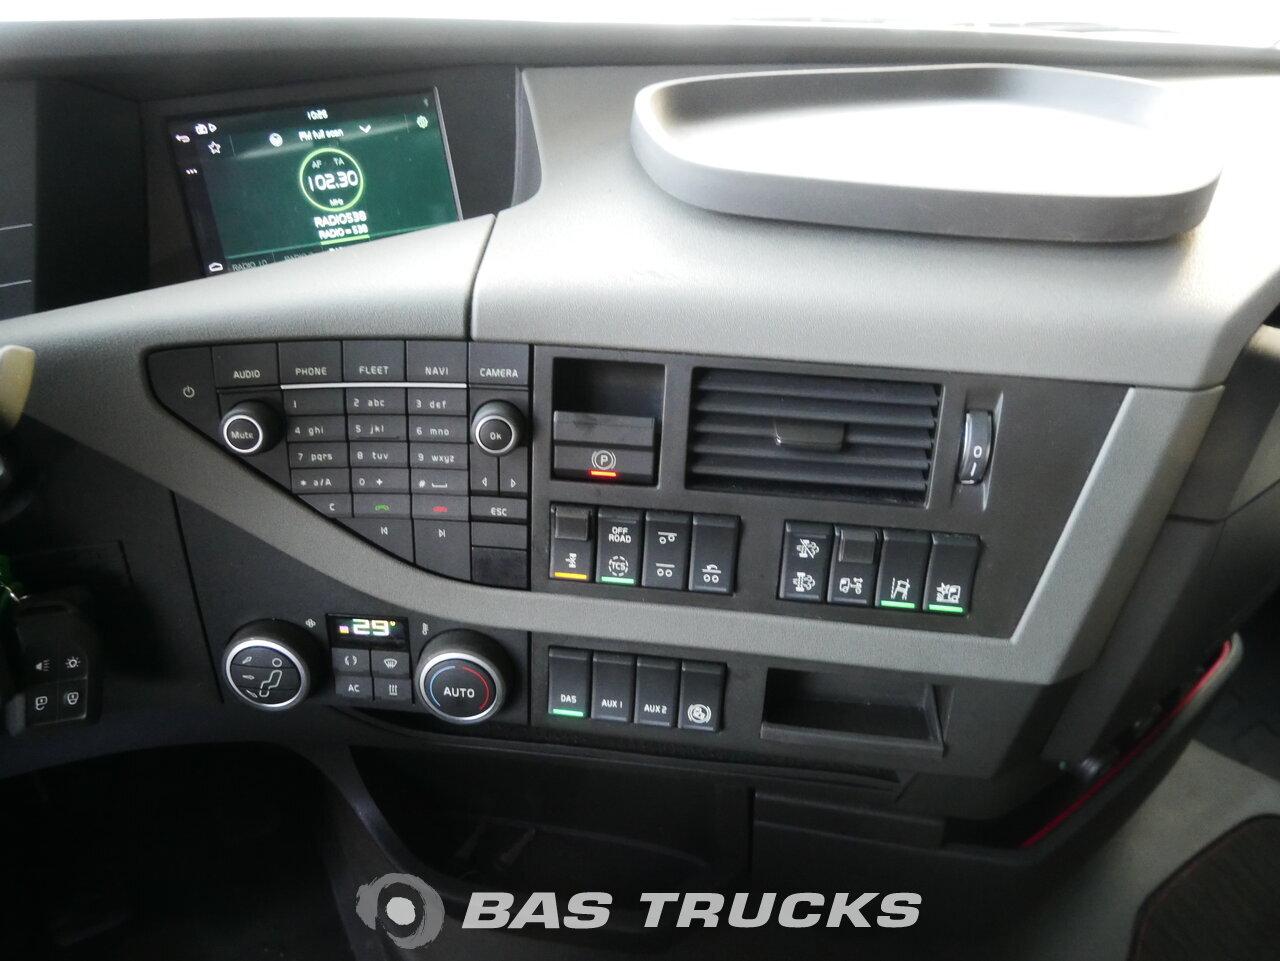 снимка на употребяван Влекачи Volvo FH 540 XL 6X2 2018